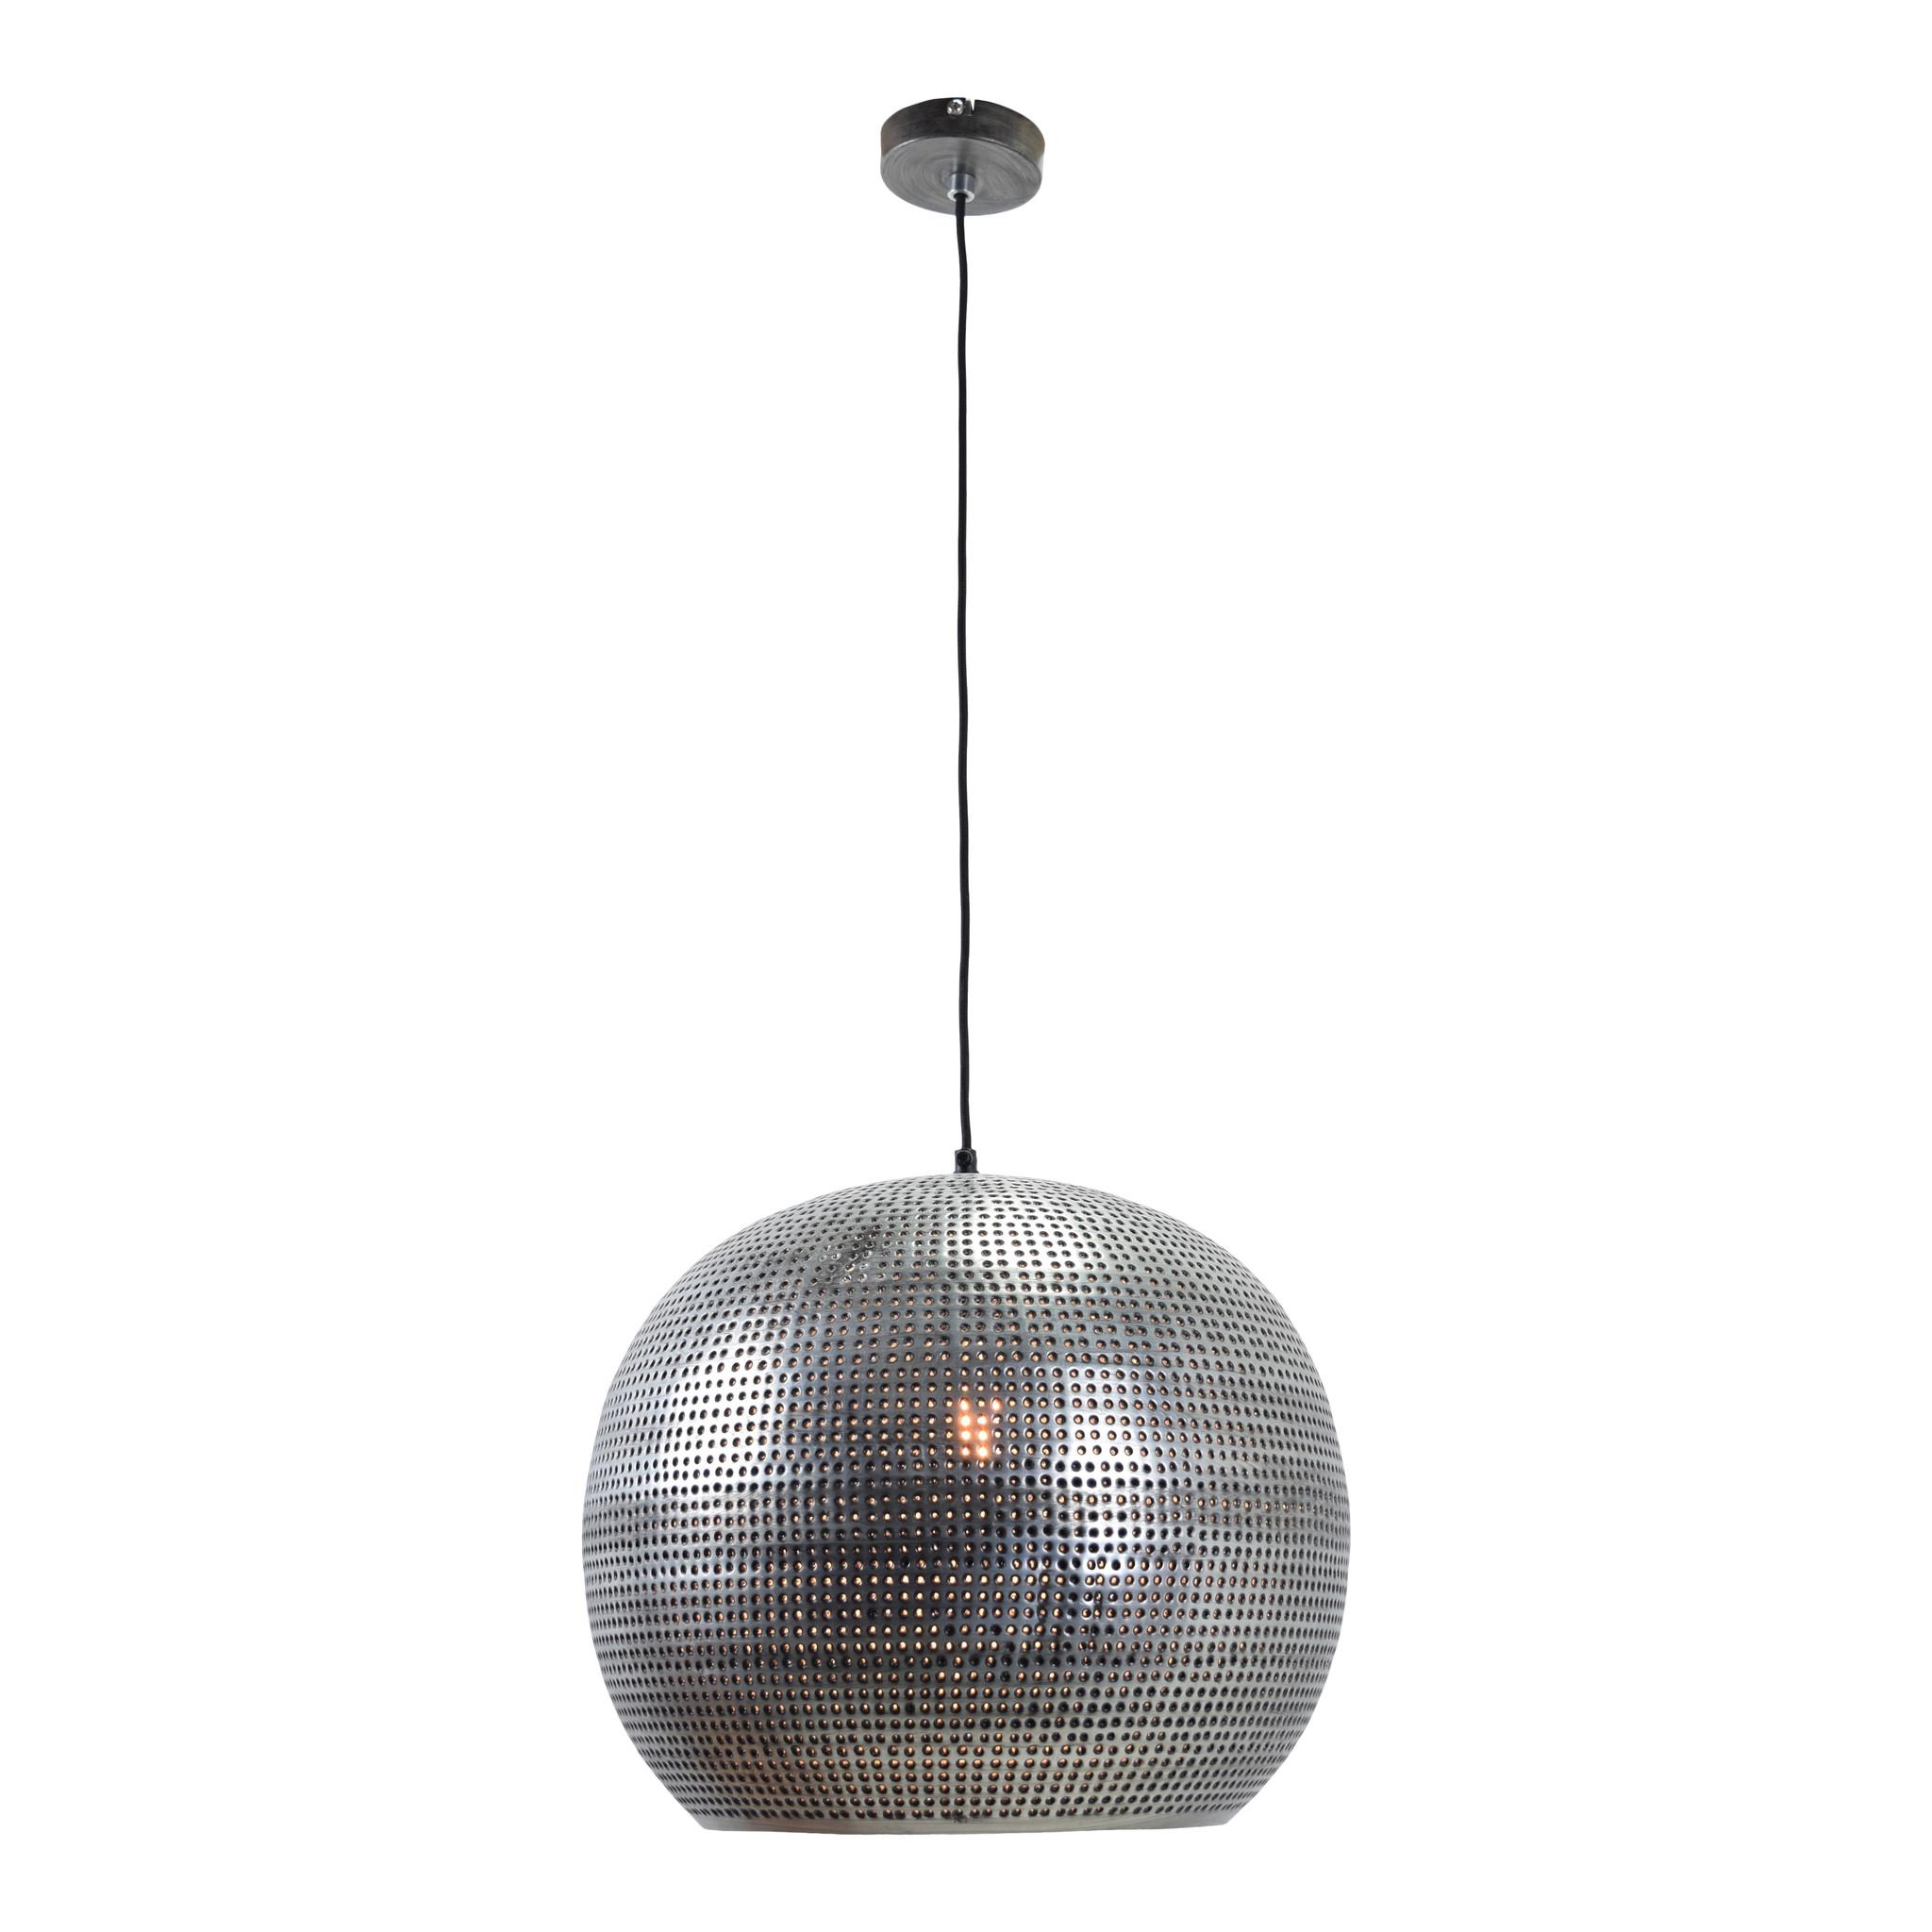 Urban Interiors Urban Interiors Hanglamp Spike bol XL ø40cm Zink